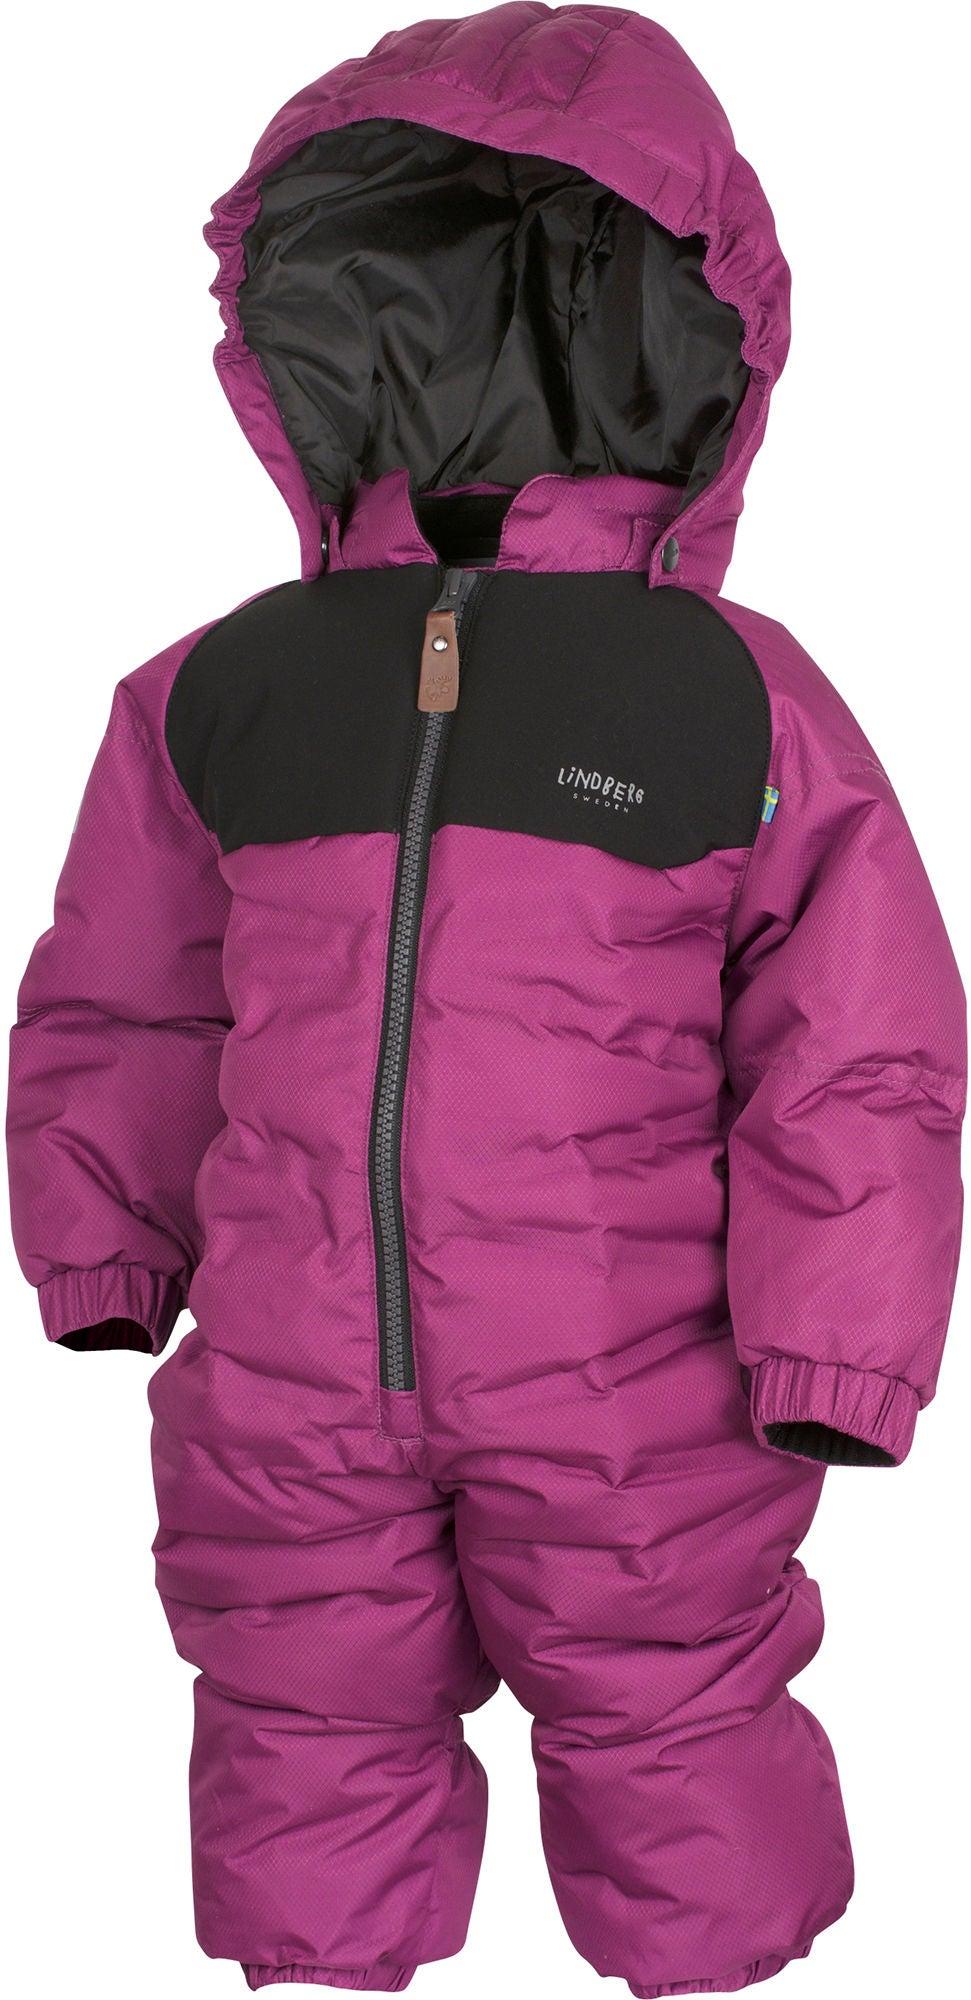 Lindberg Zermatt Babyoverall, Cerise 62